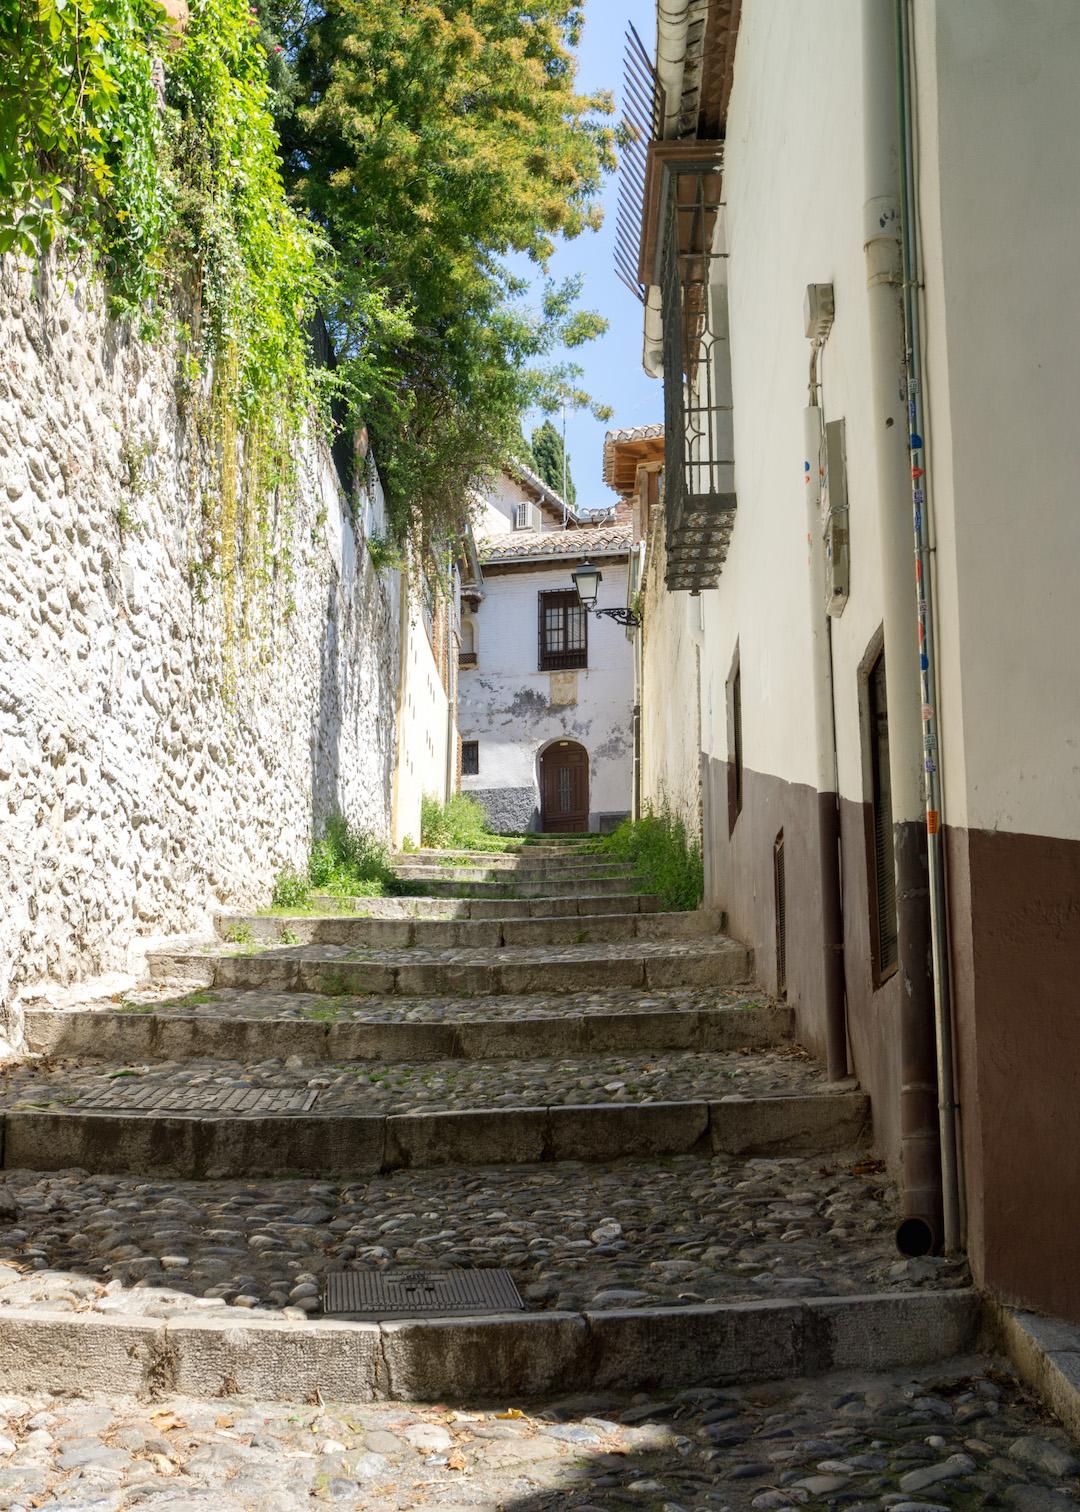 Her_Travel_Edit_Granada_Stairs